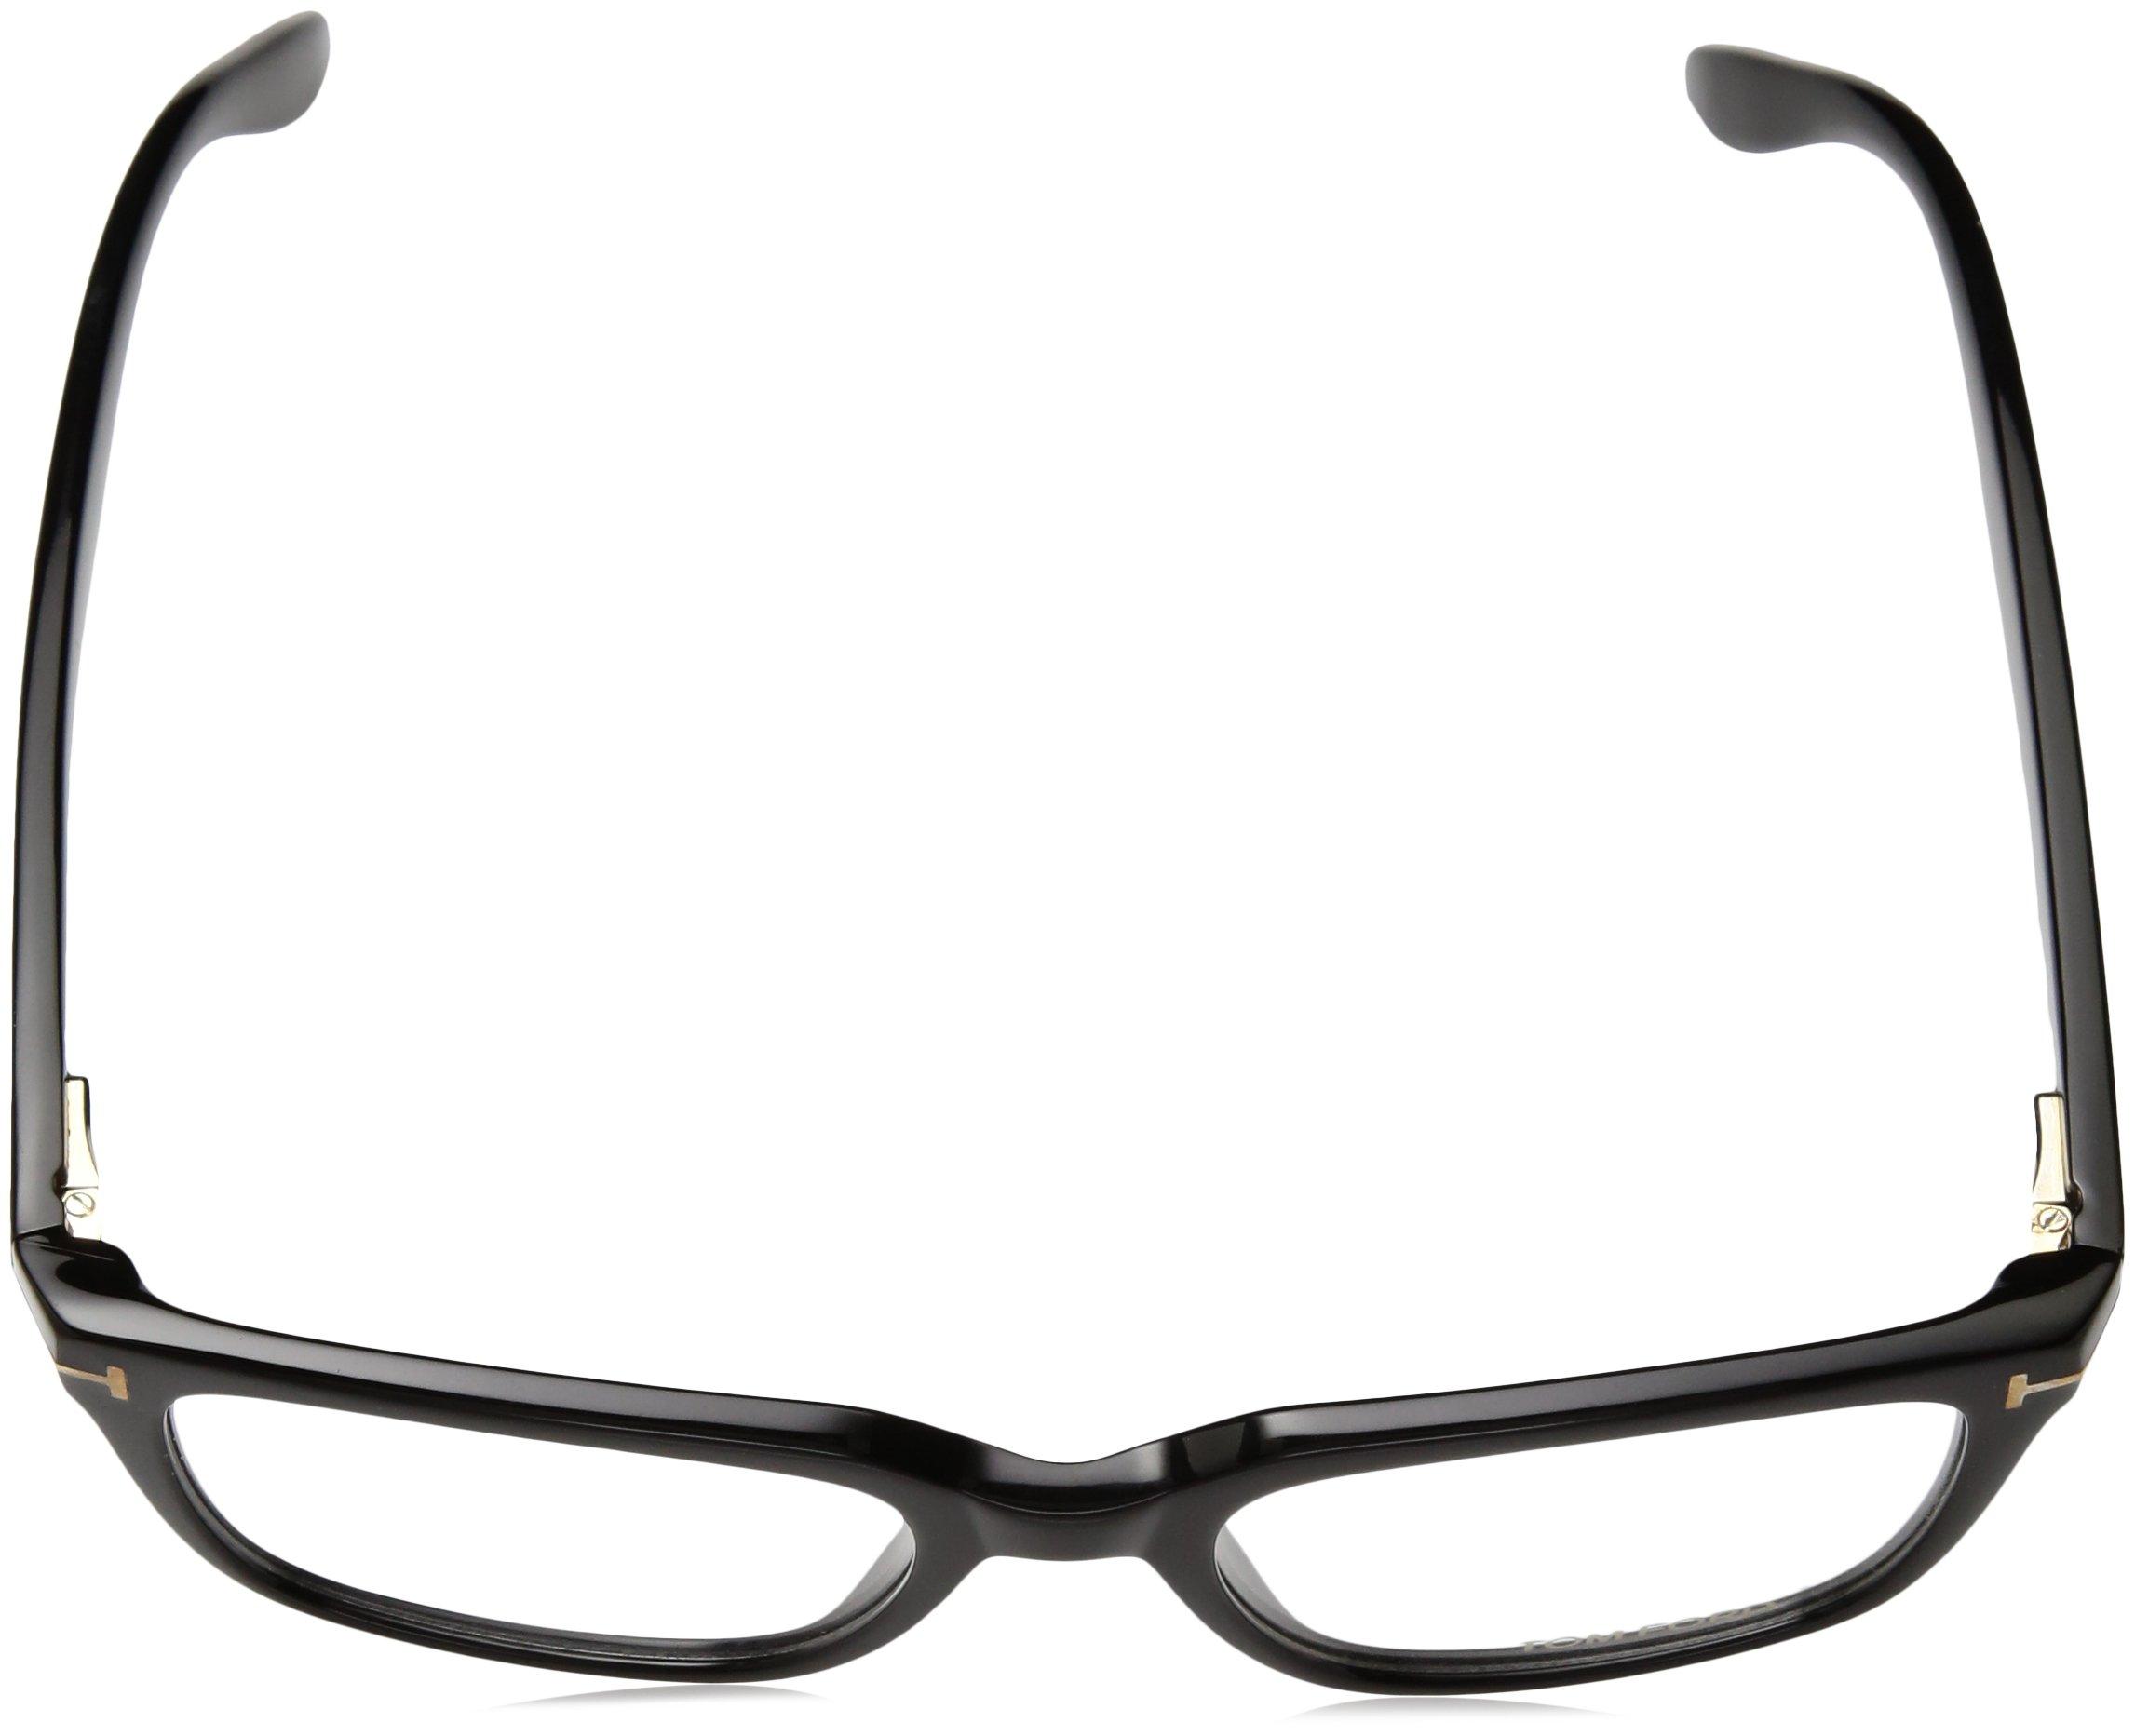 TOM Ford Eyeglasses Tf 5304 001 Shiny Black Tf5304-001-54mm by Tom Ford (Image #4)